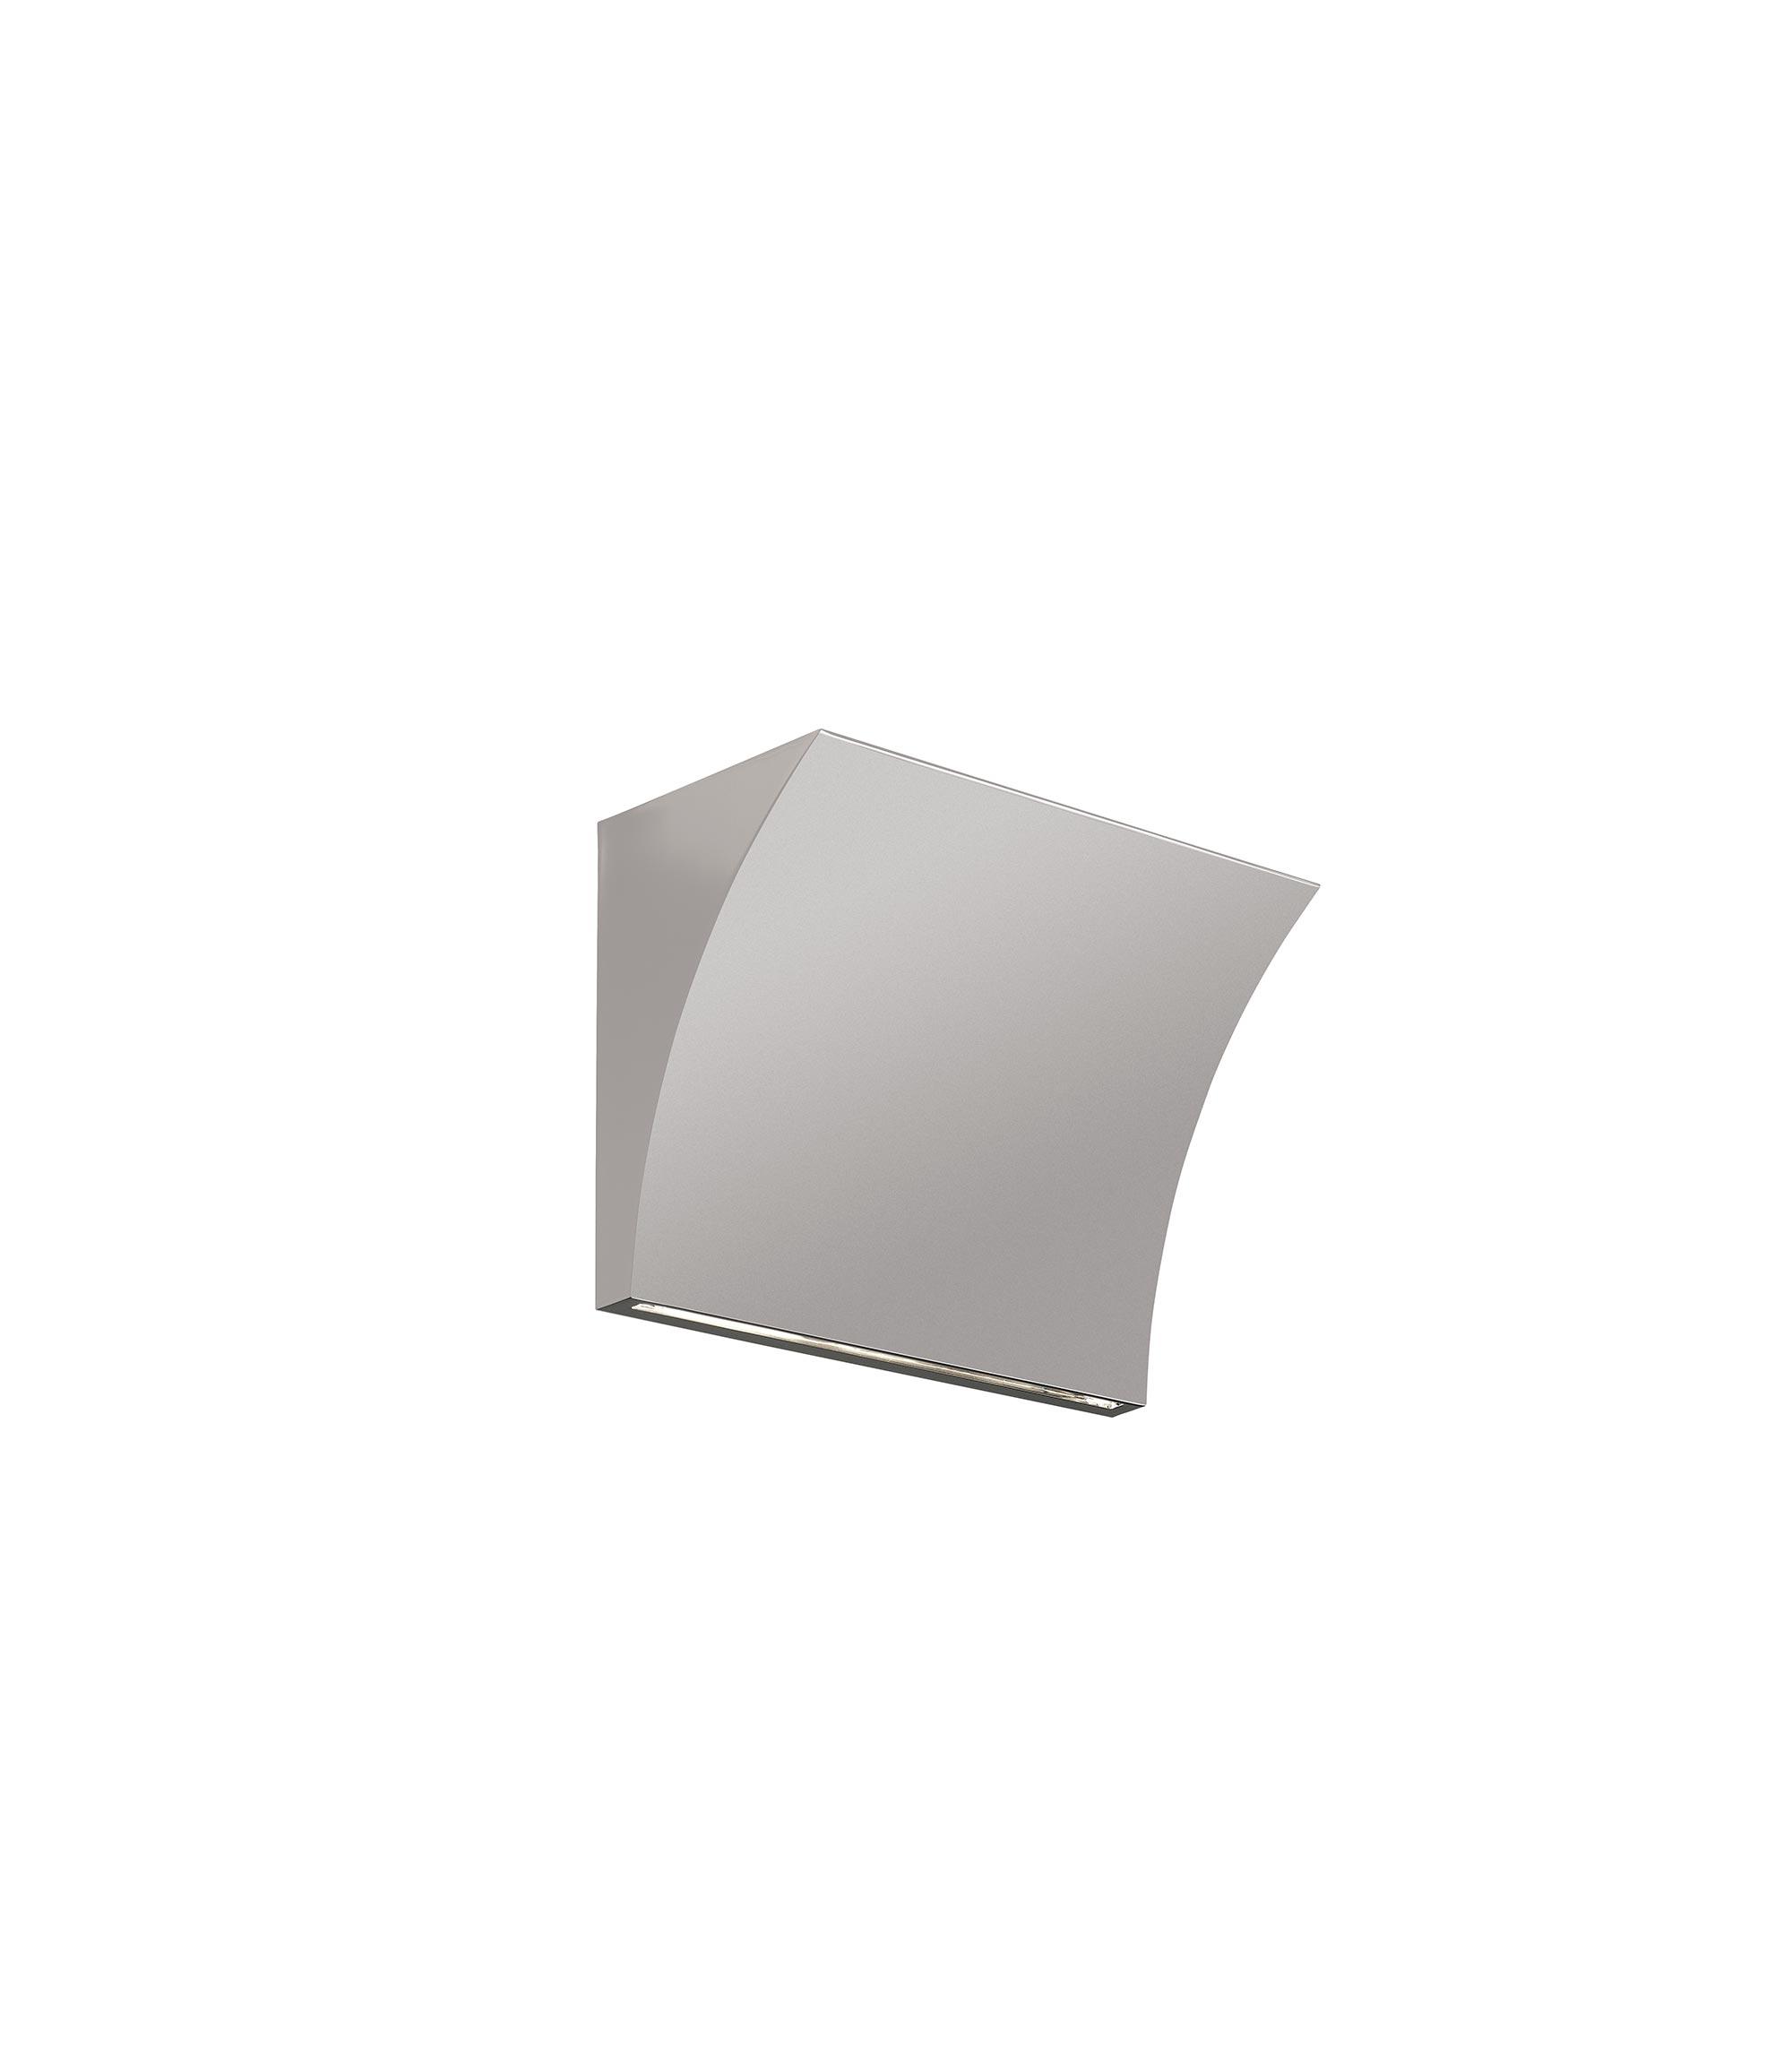 Pochette up down wall dordoni flos F9701020 product still life big 1